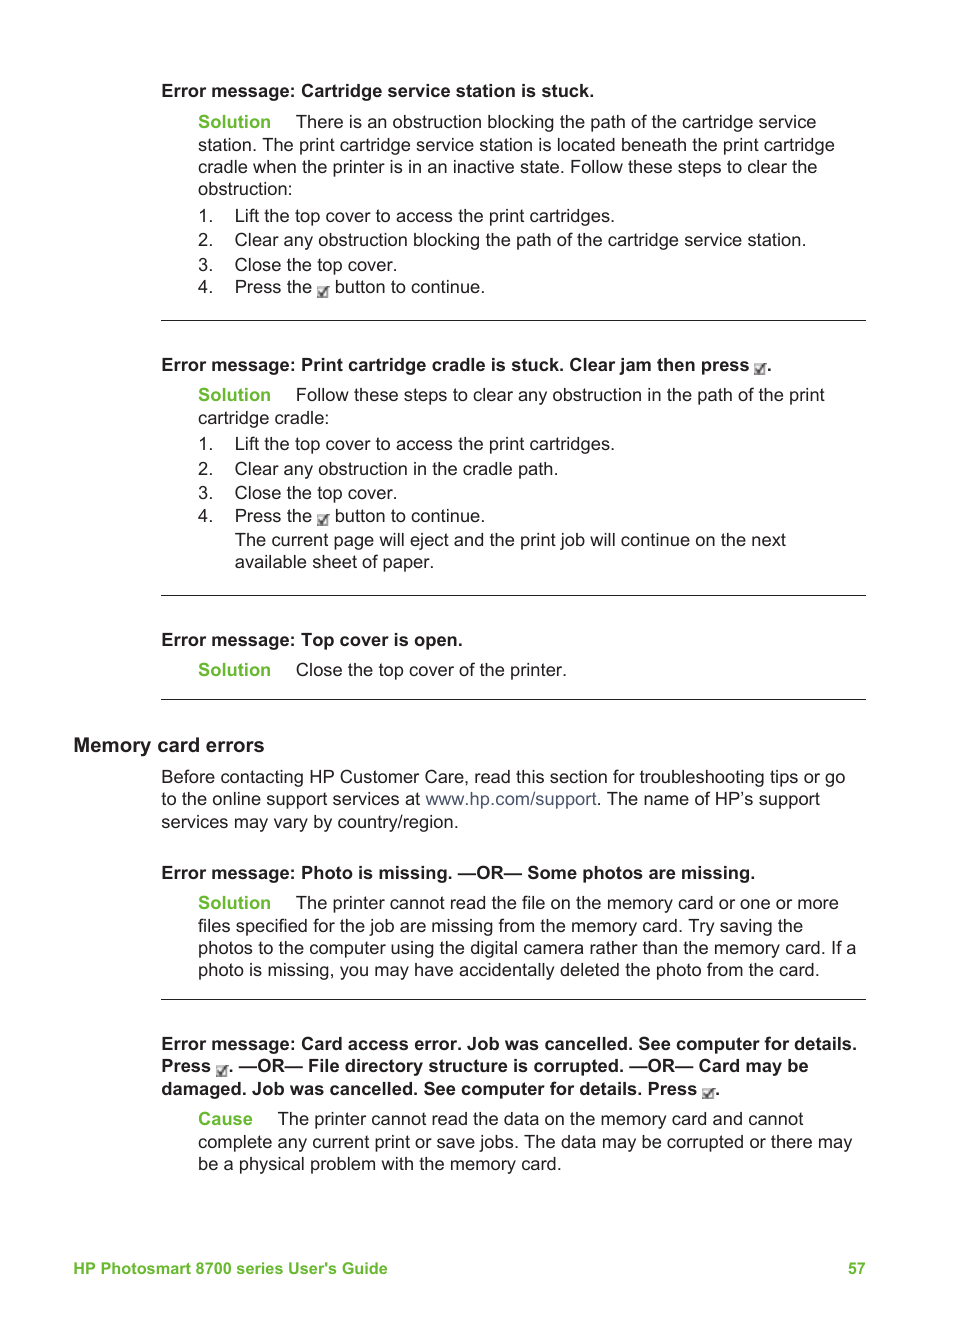 Memory card errors | HP Photosmart 8750 Professional Photo Printer User  Manual | Page 61 / 83